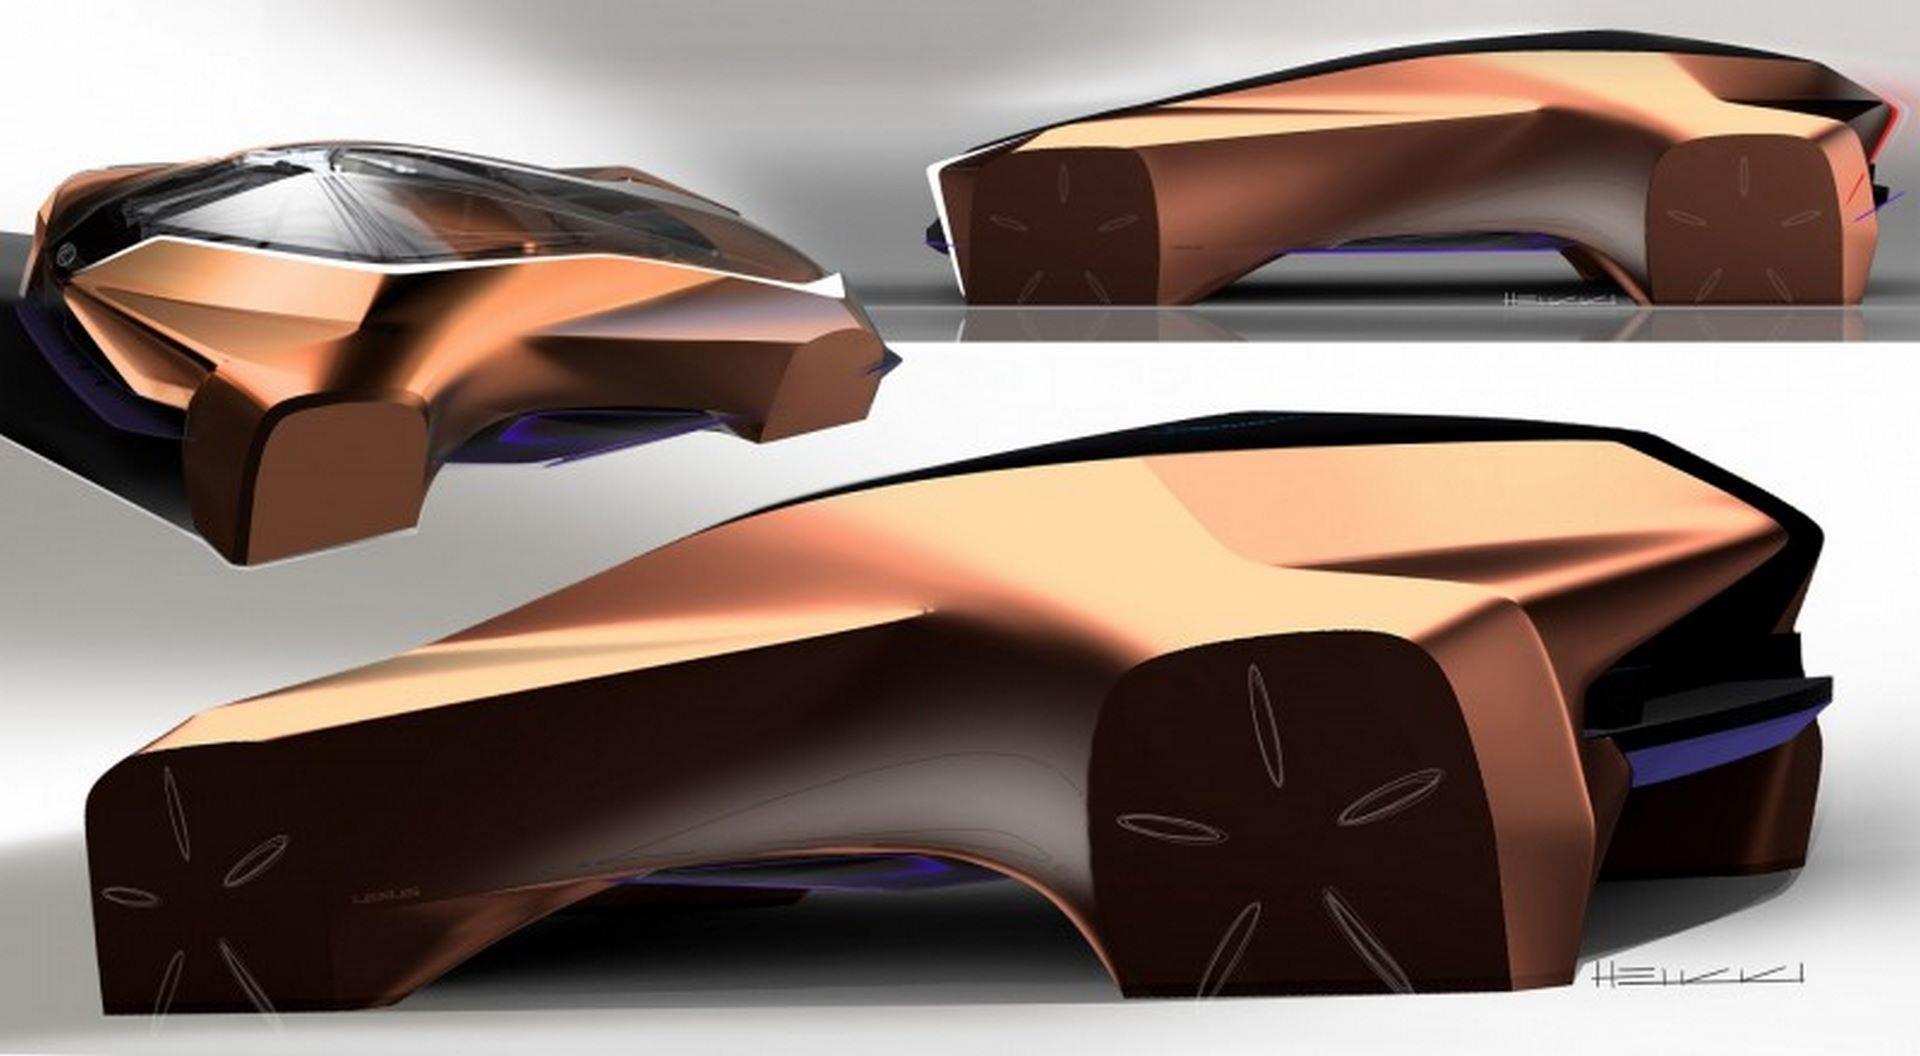 Lexus-LF-30-Concept-77